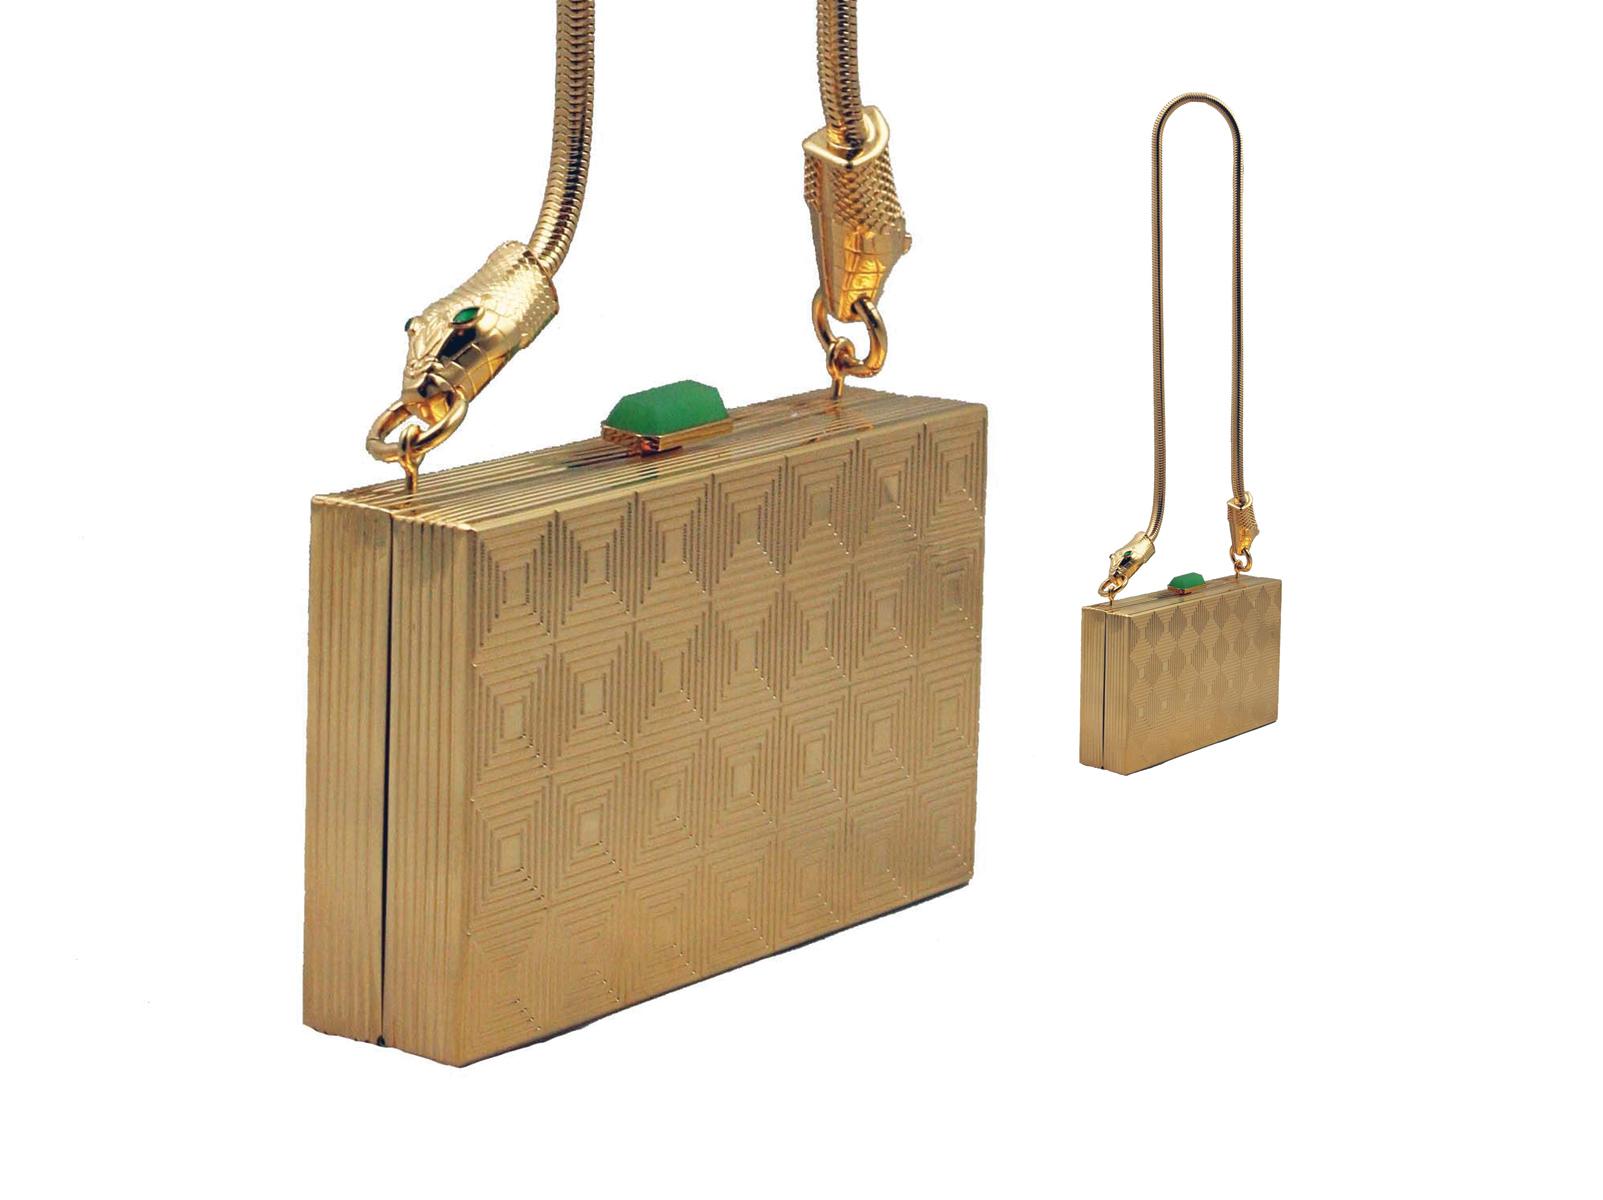 Сумка-коробочка, Ralph Lauren  Третьяковский пр., 1, тел. (495) 933 3384